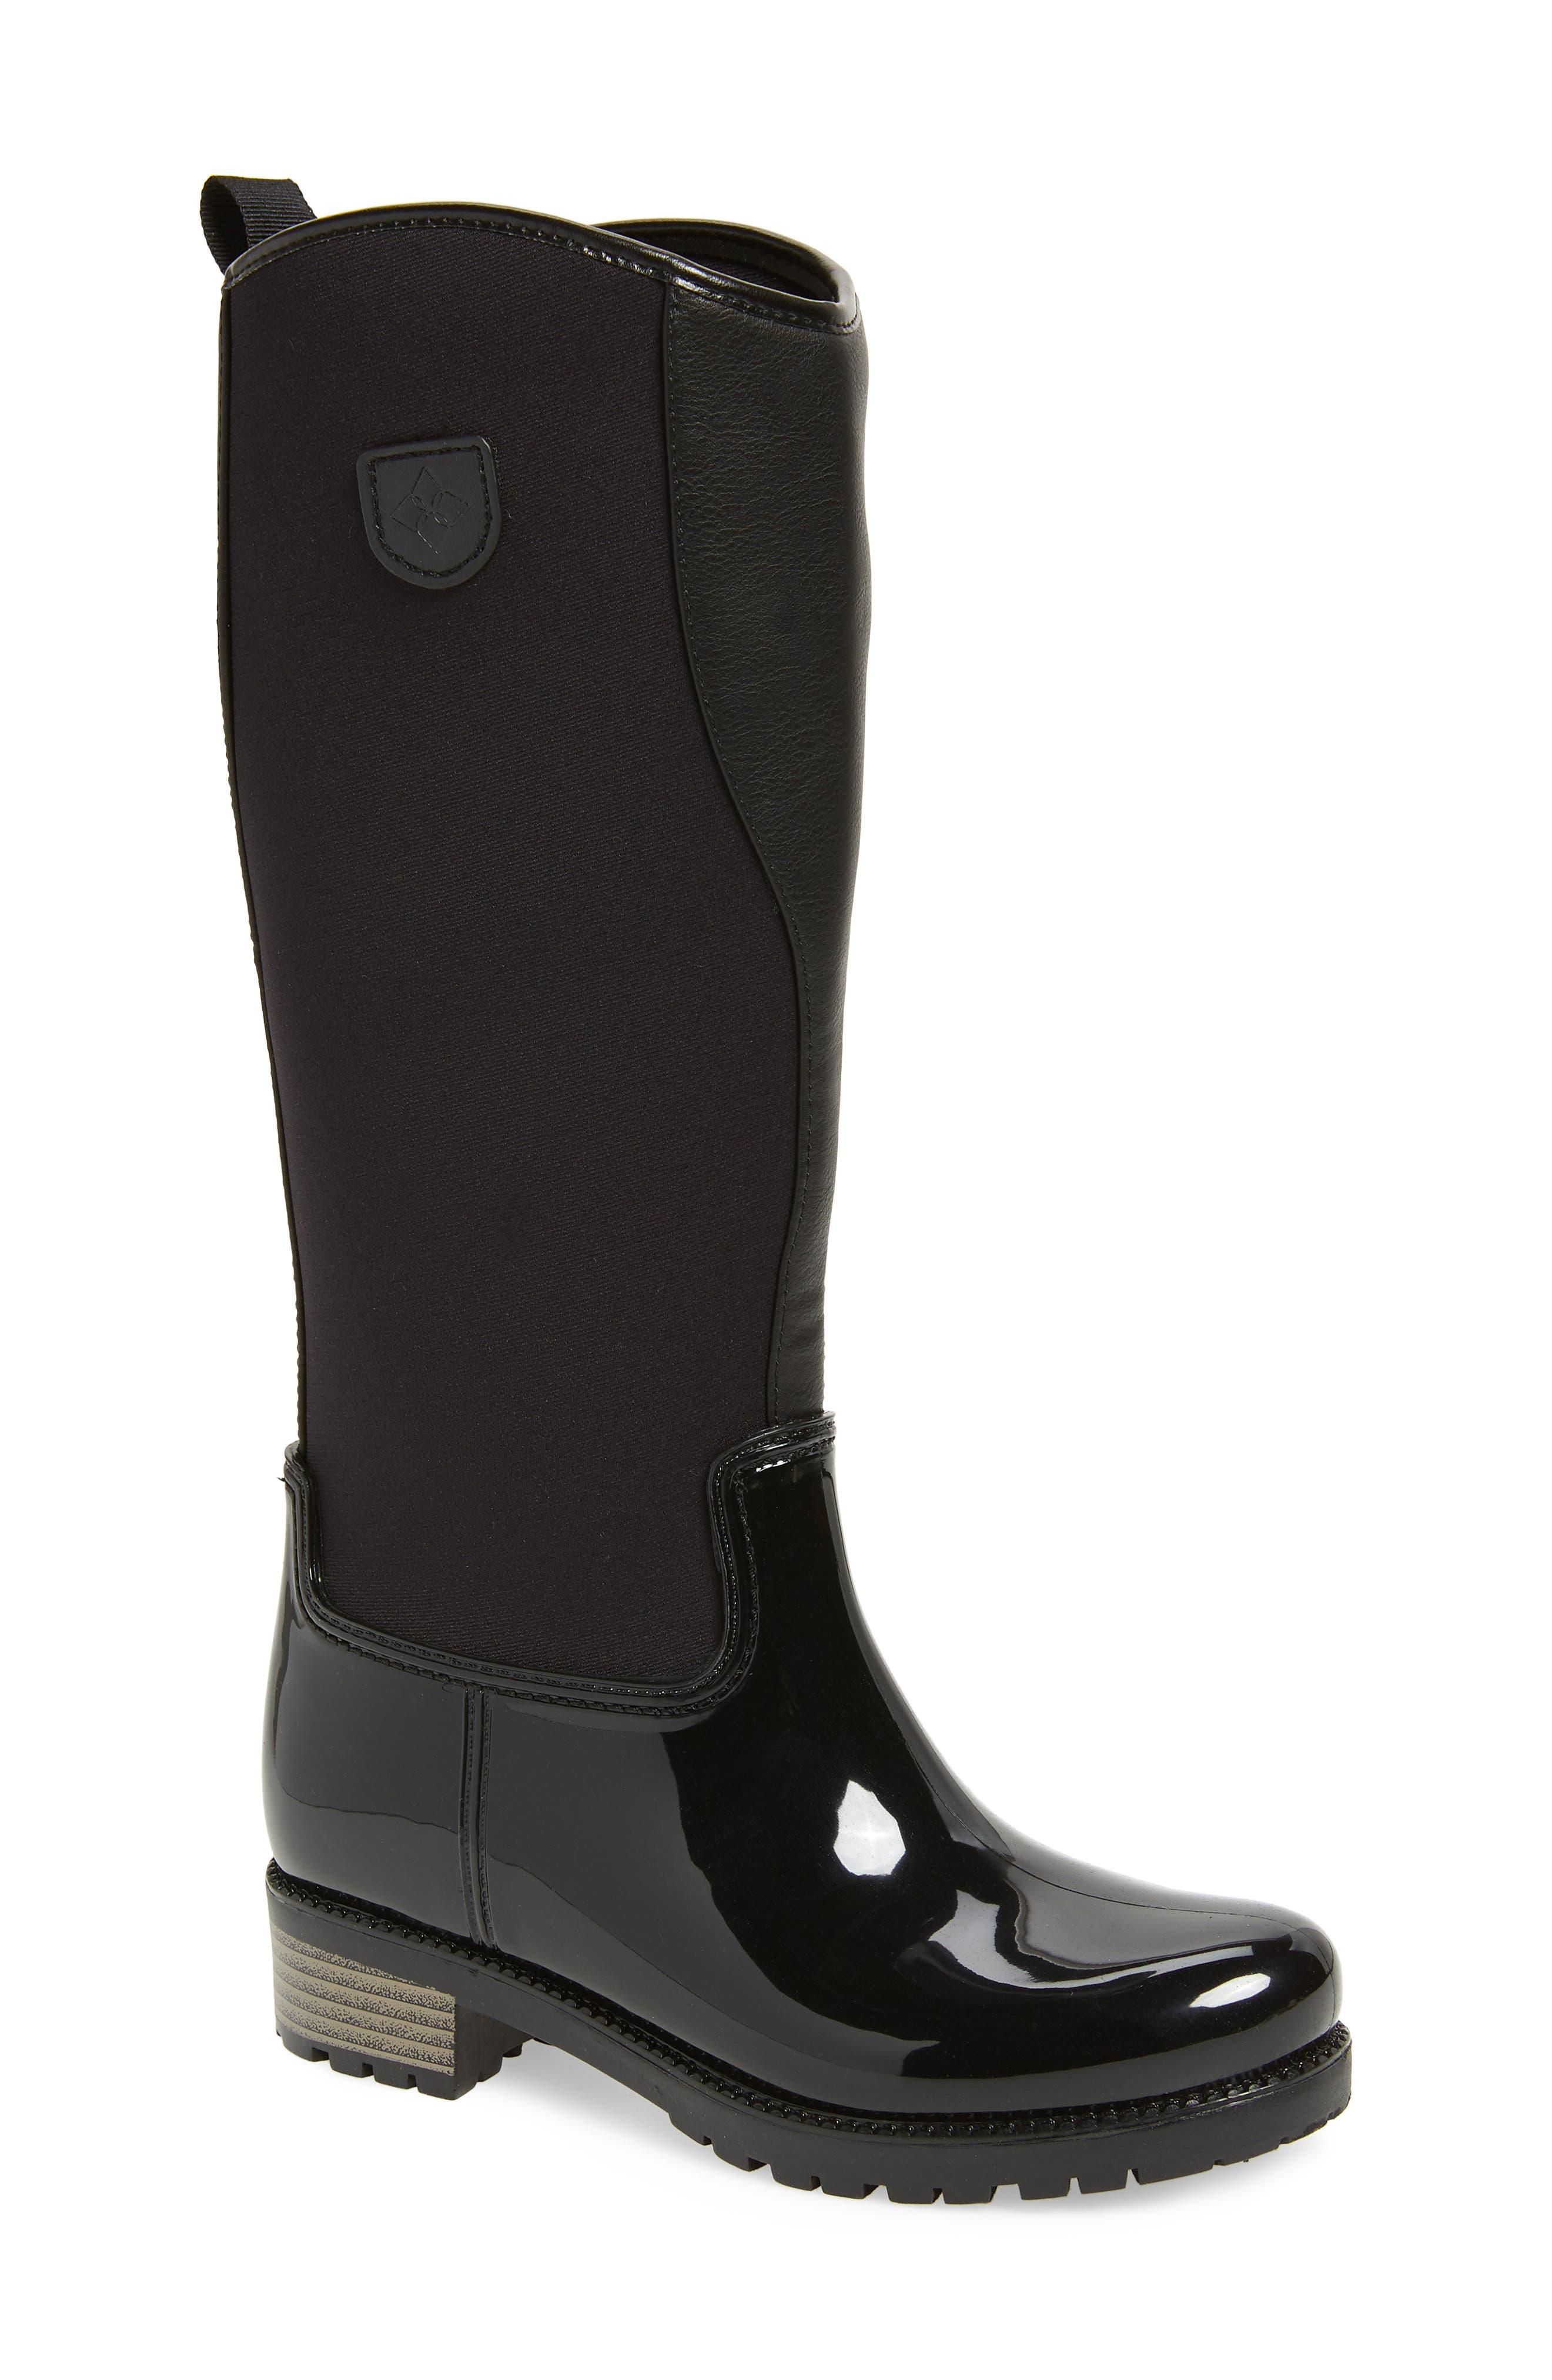 Parma 2 Tall Waterproof Rain Boot,                             Main thumbnail 1, color,                             BLACK FABRIC